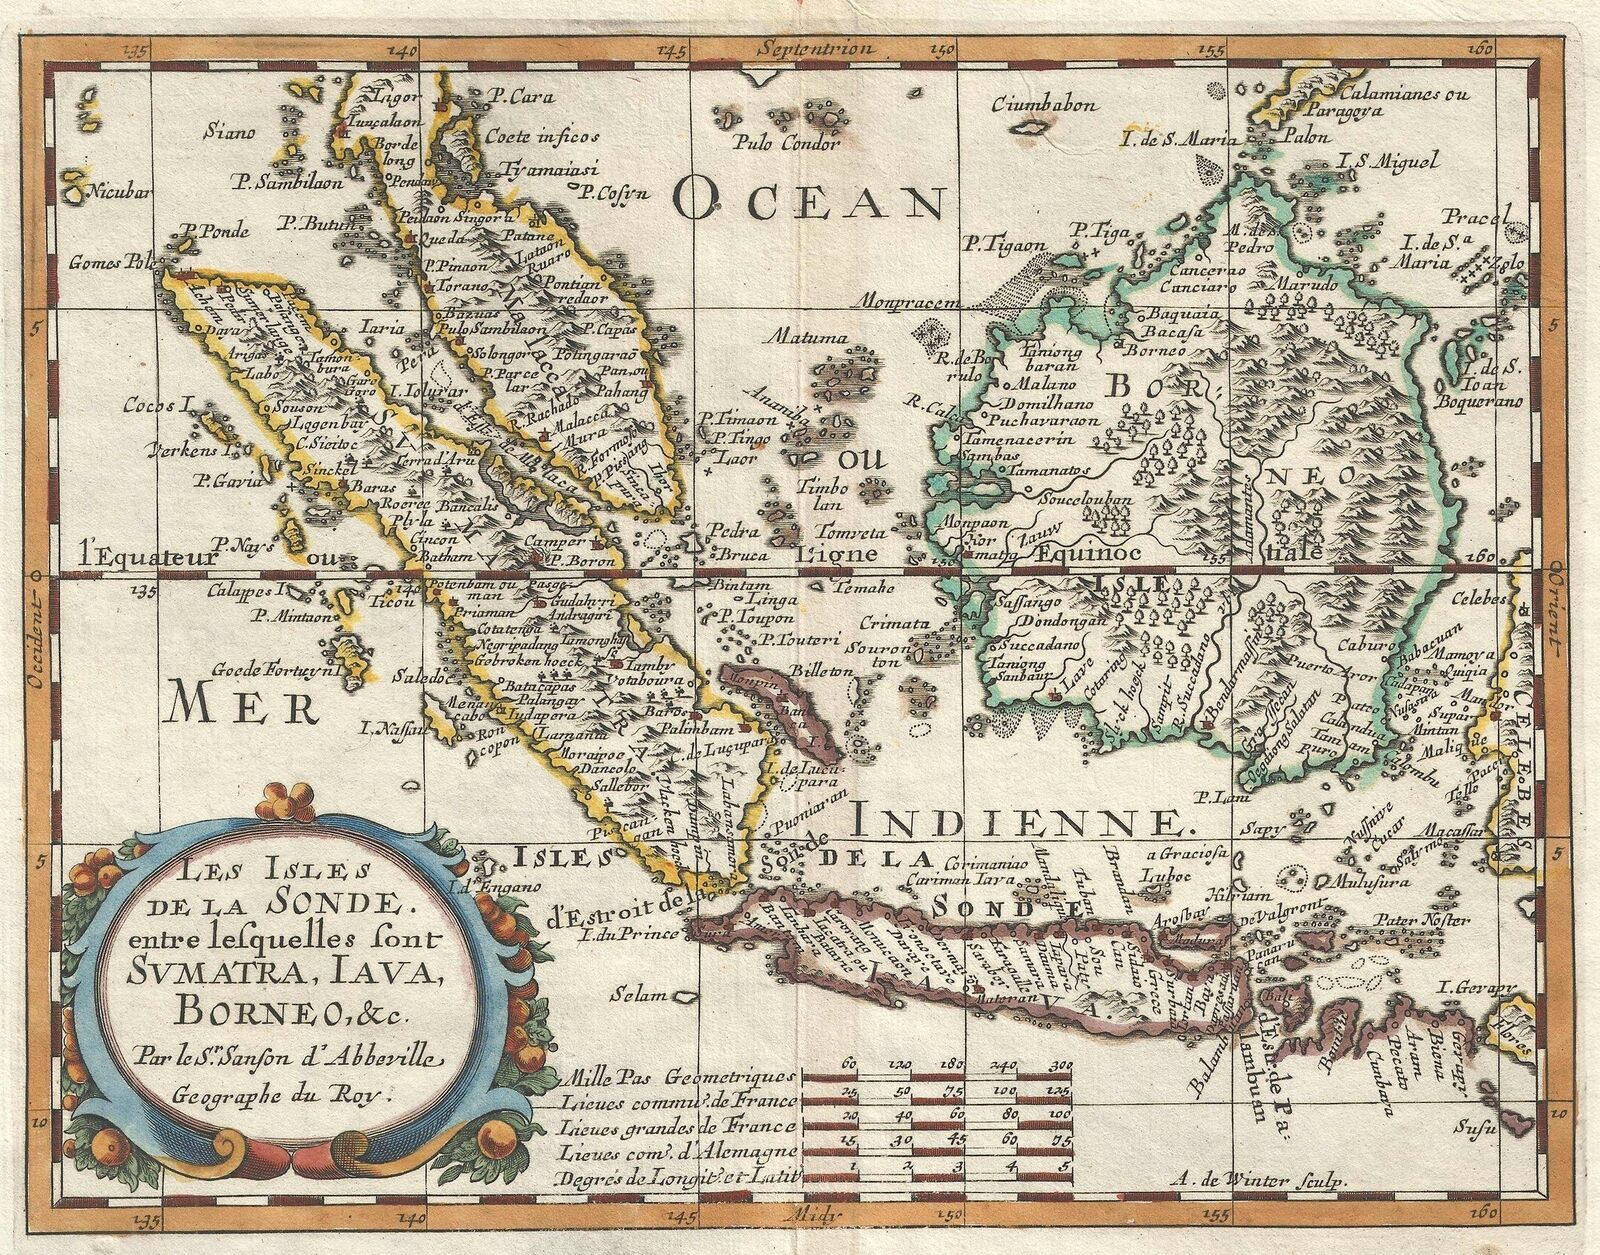 1657 Sanson Map of the East Indies Sumatra Java Borneo